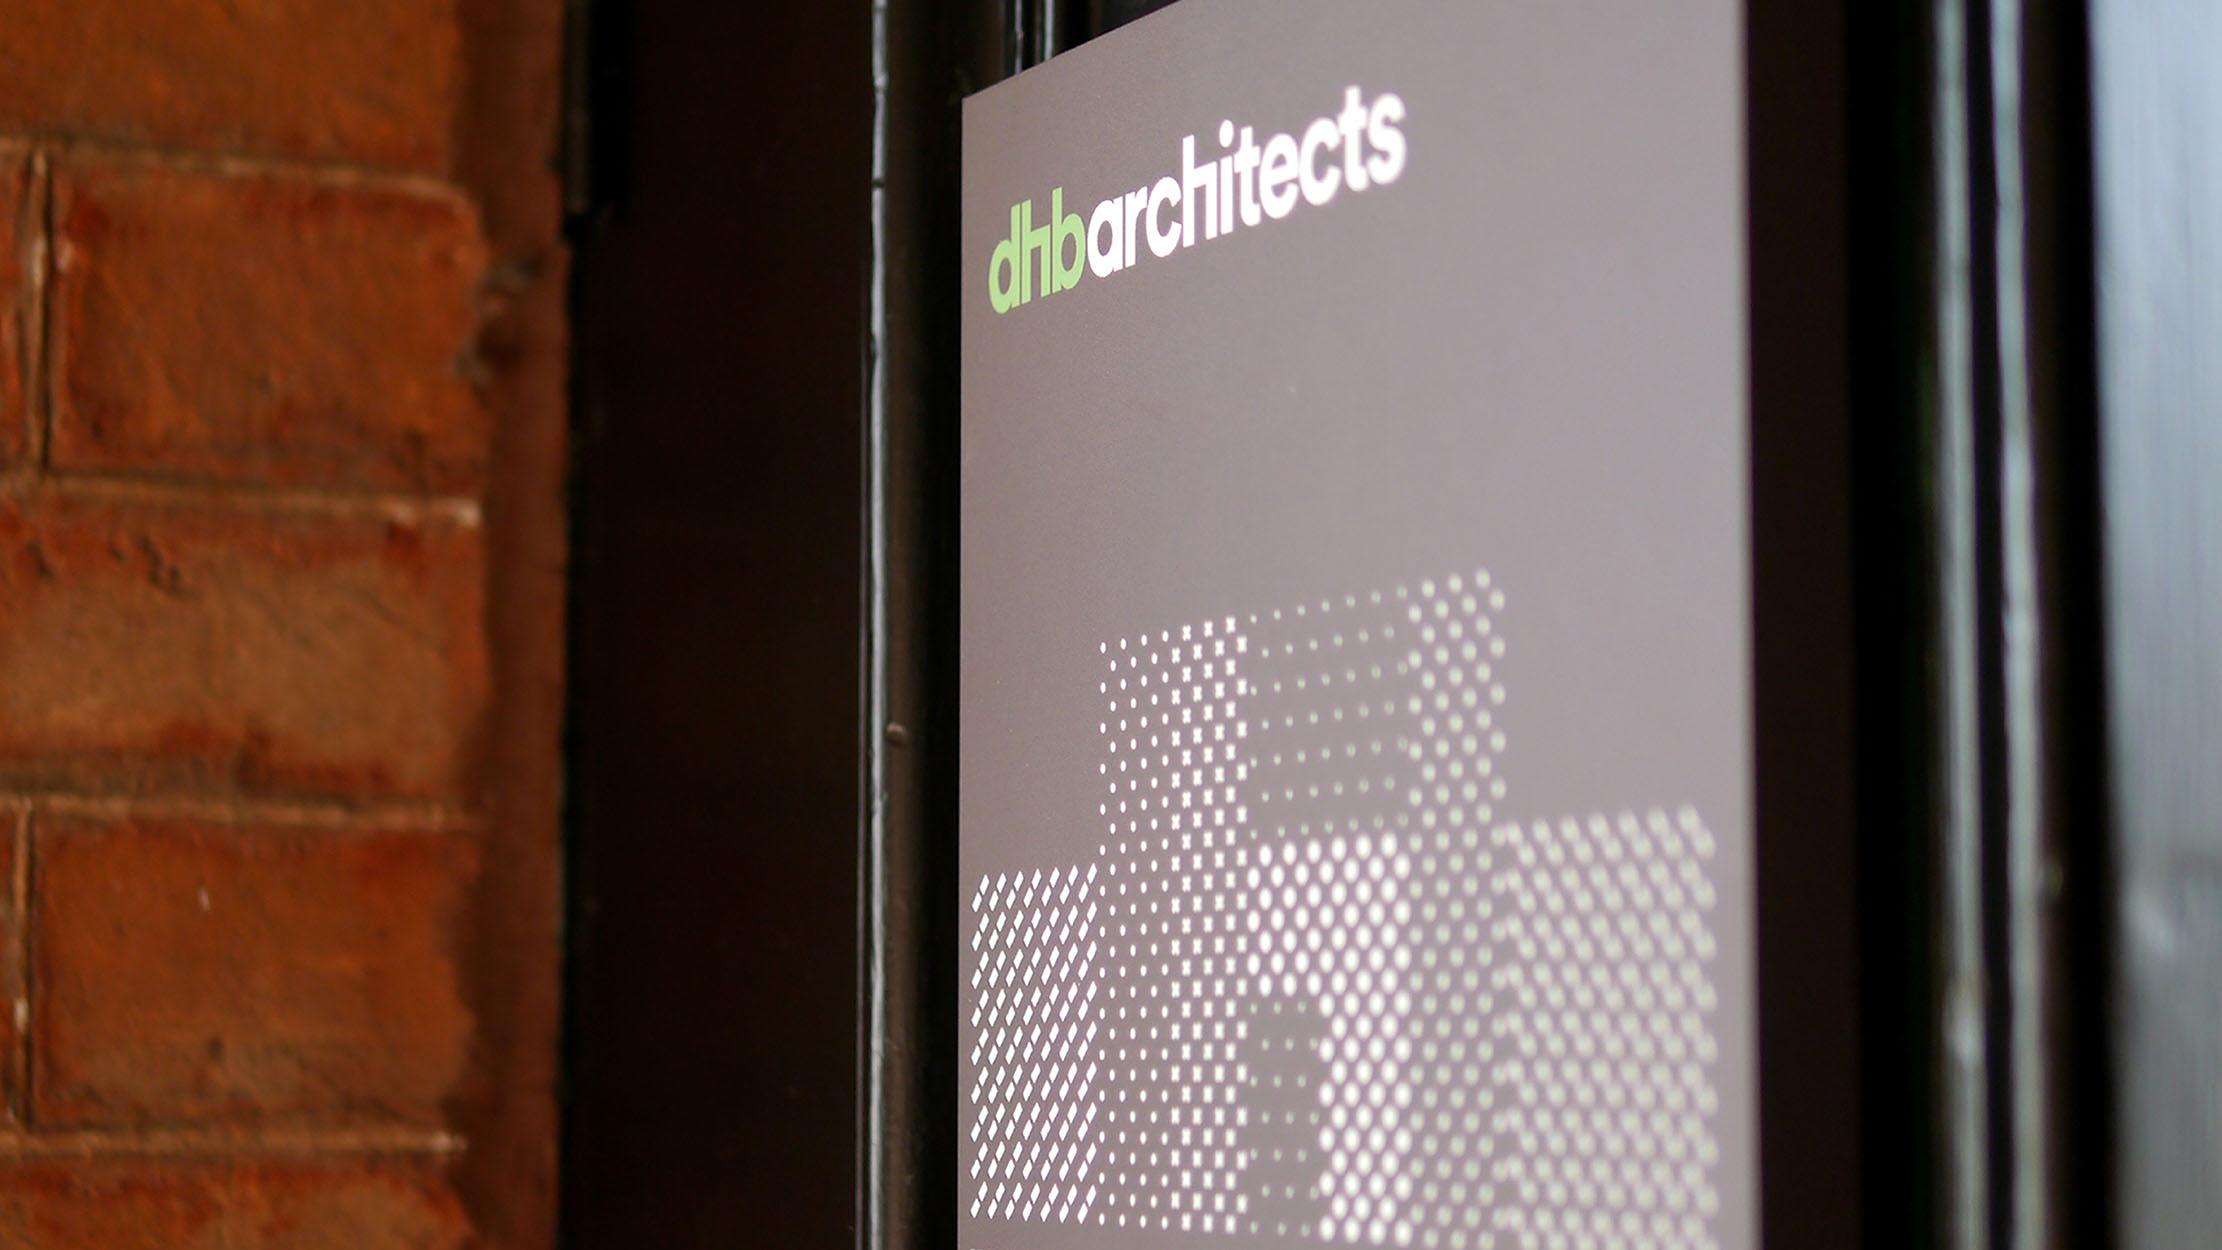 dhb architects -2